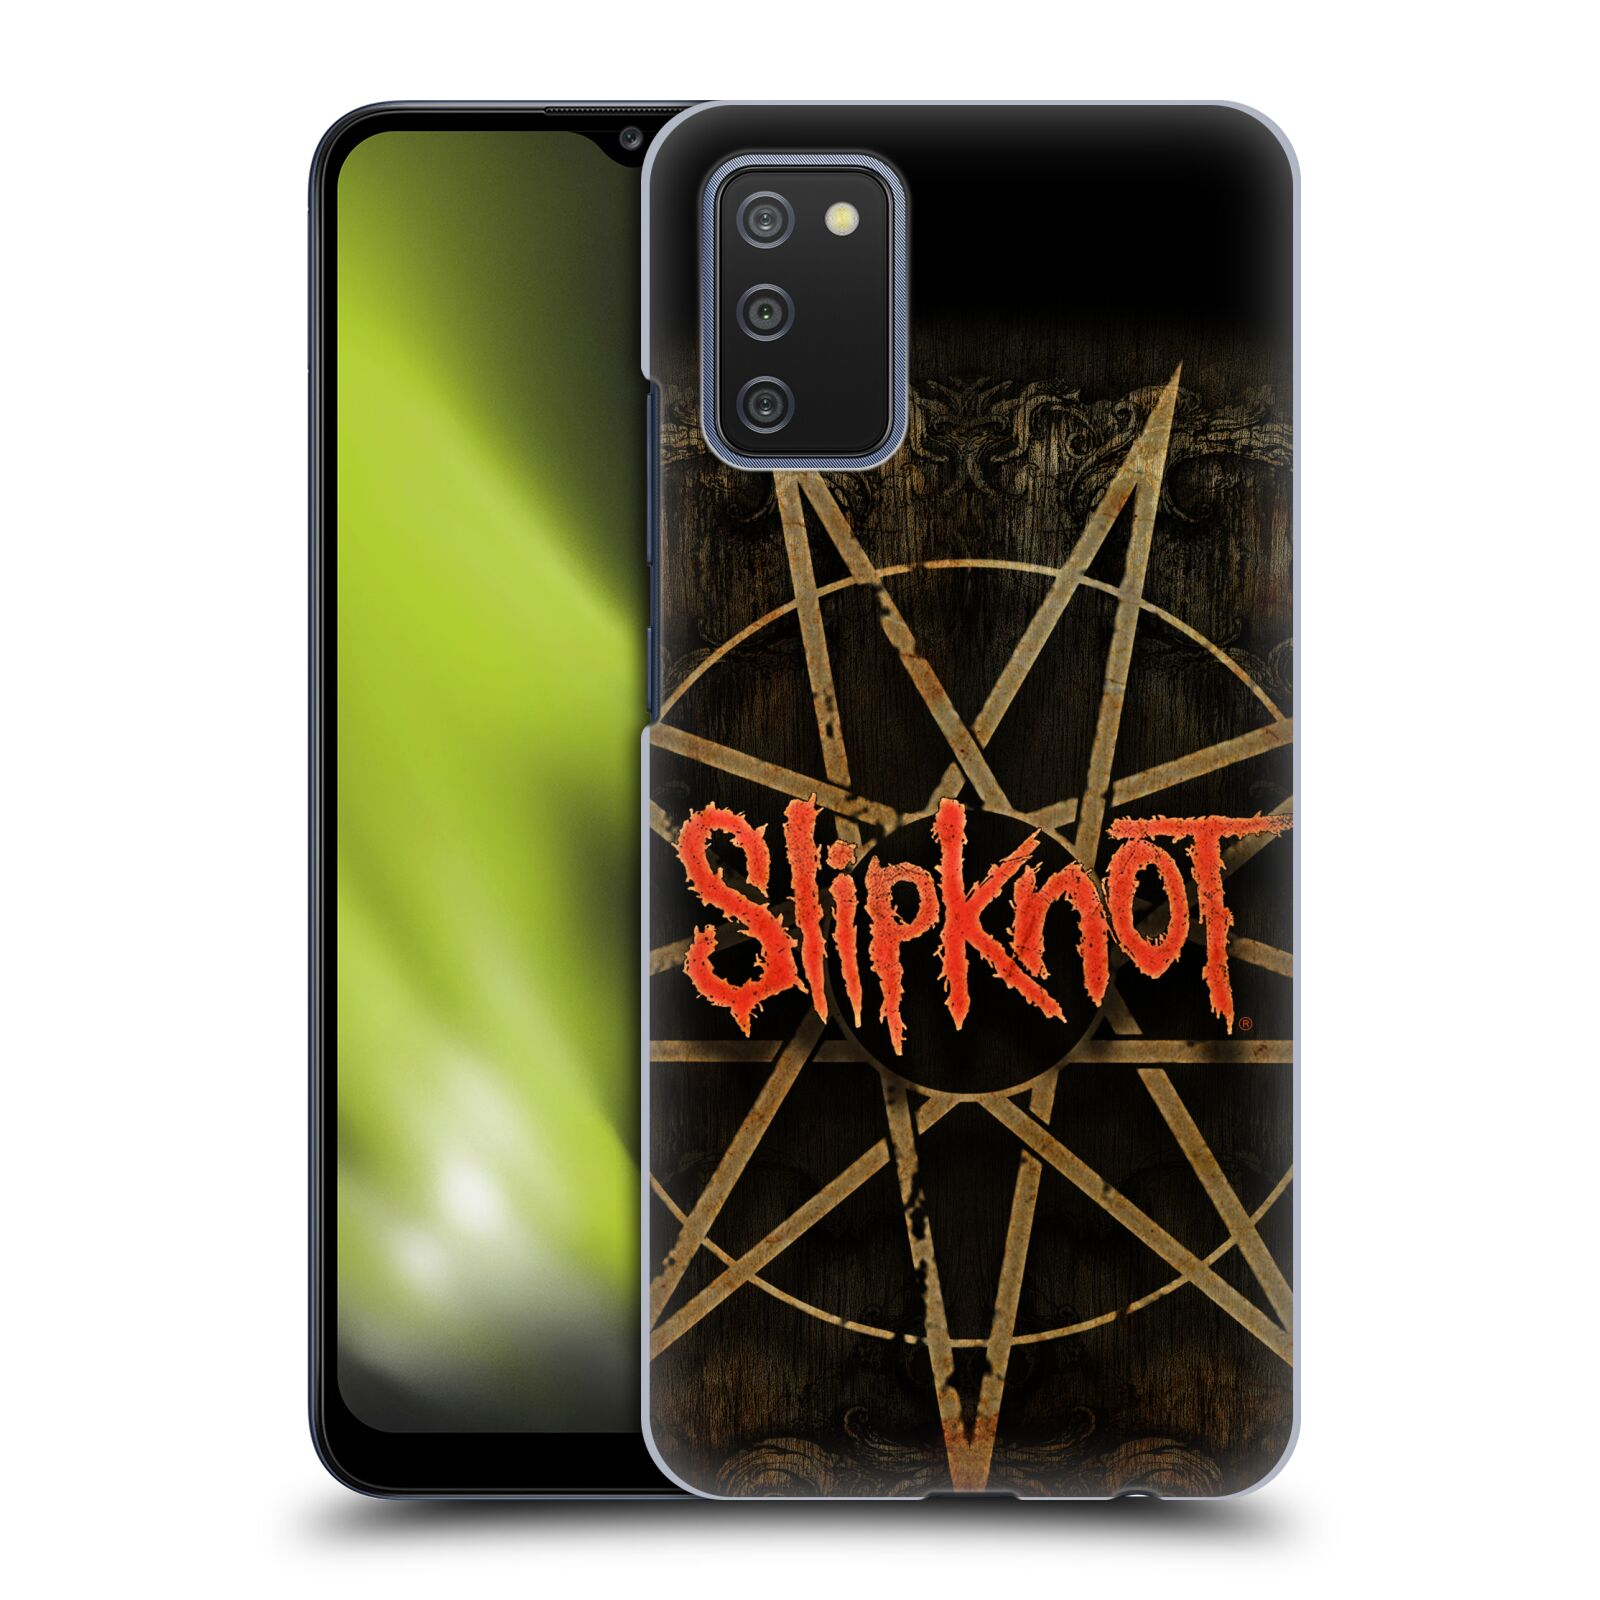 Plastové pouzdro na mobil Samsung Galaxy A02s - Head Case - Slipknot - Znak